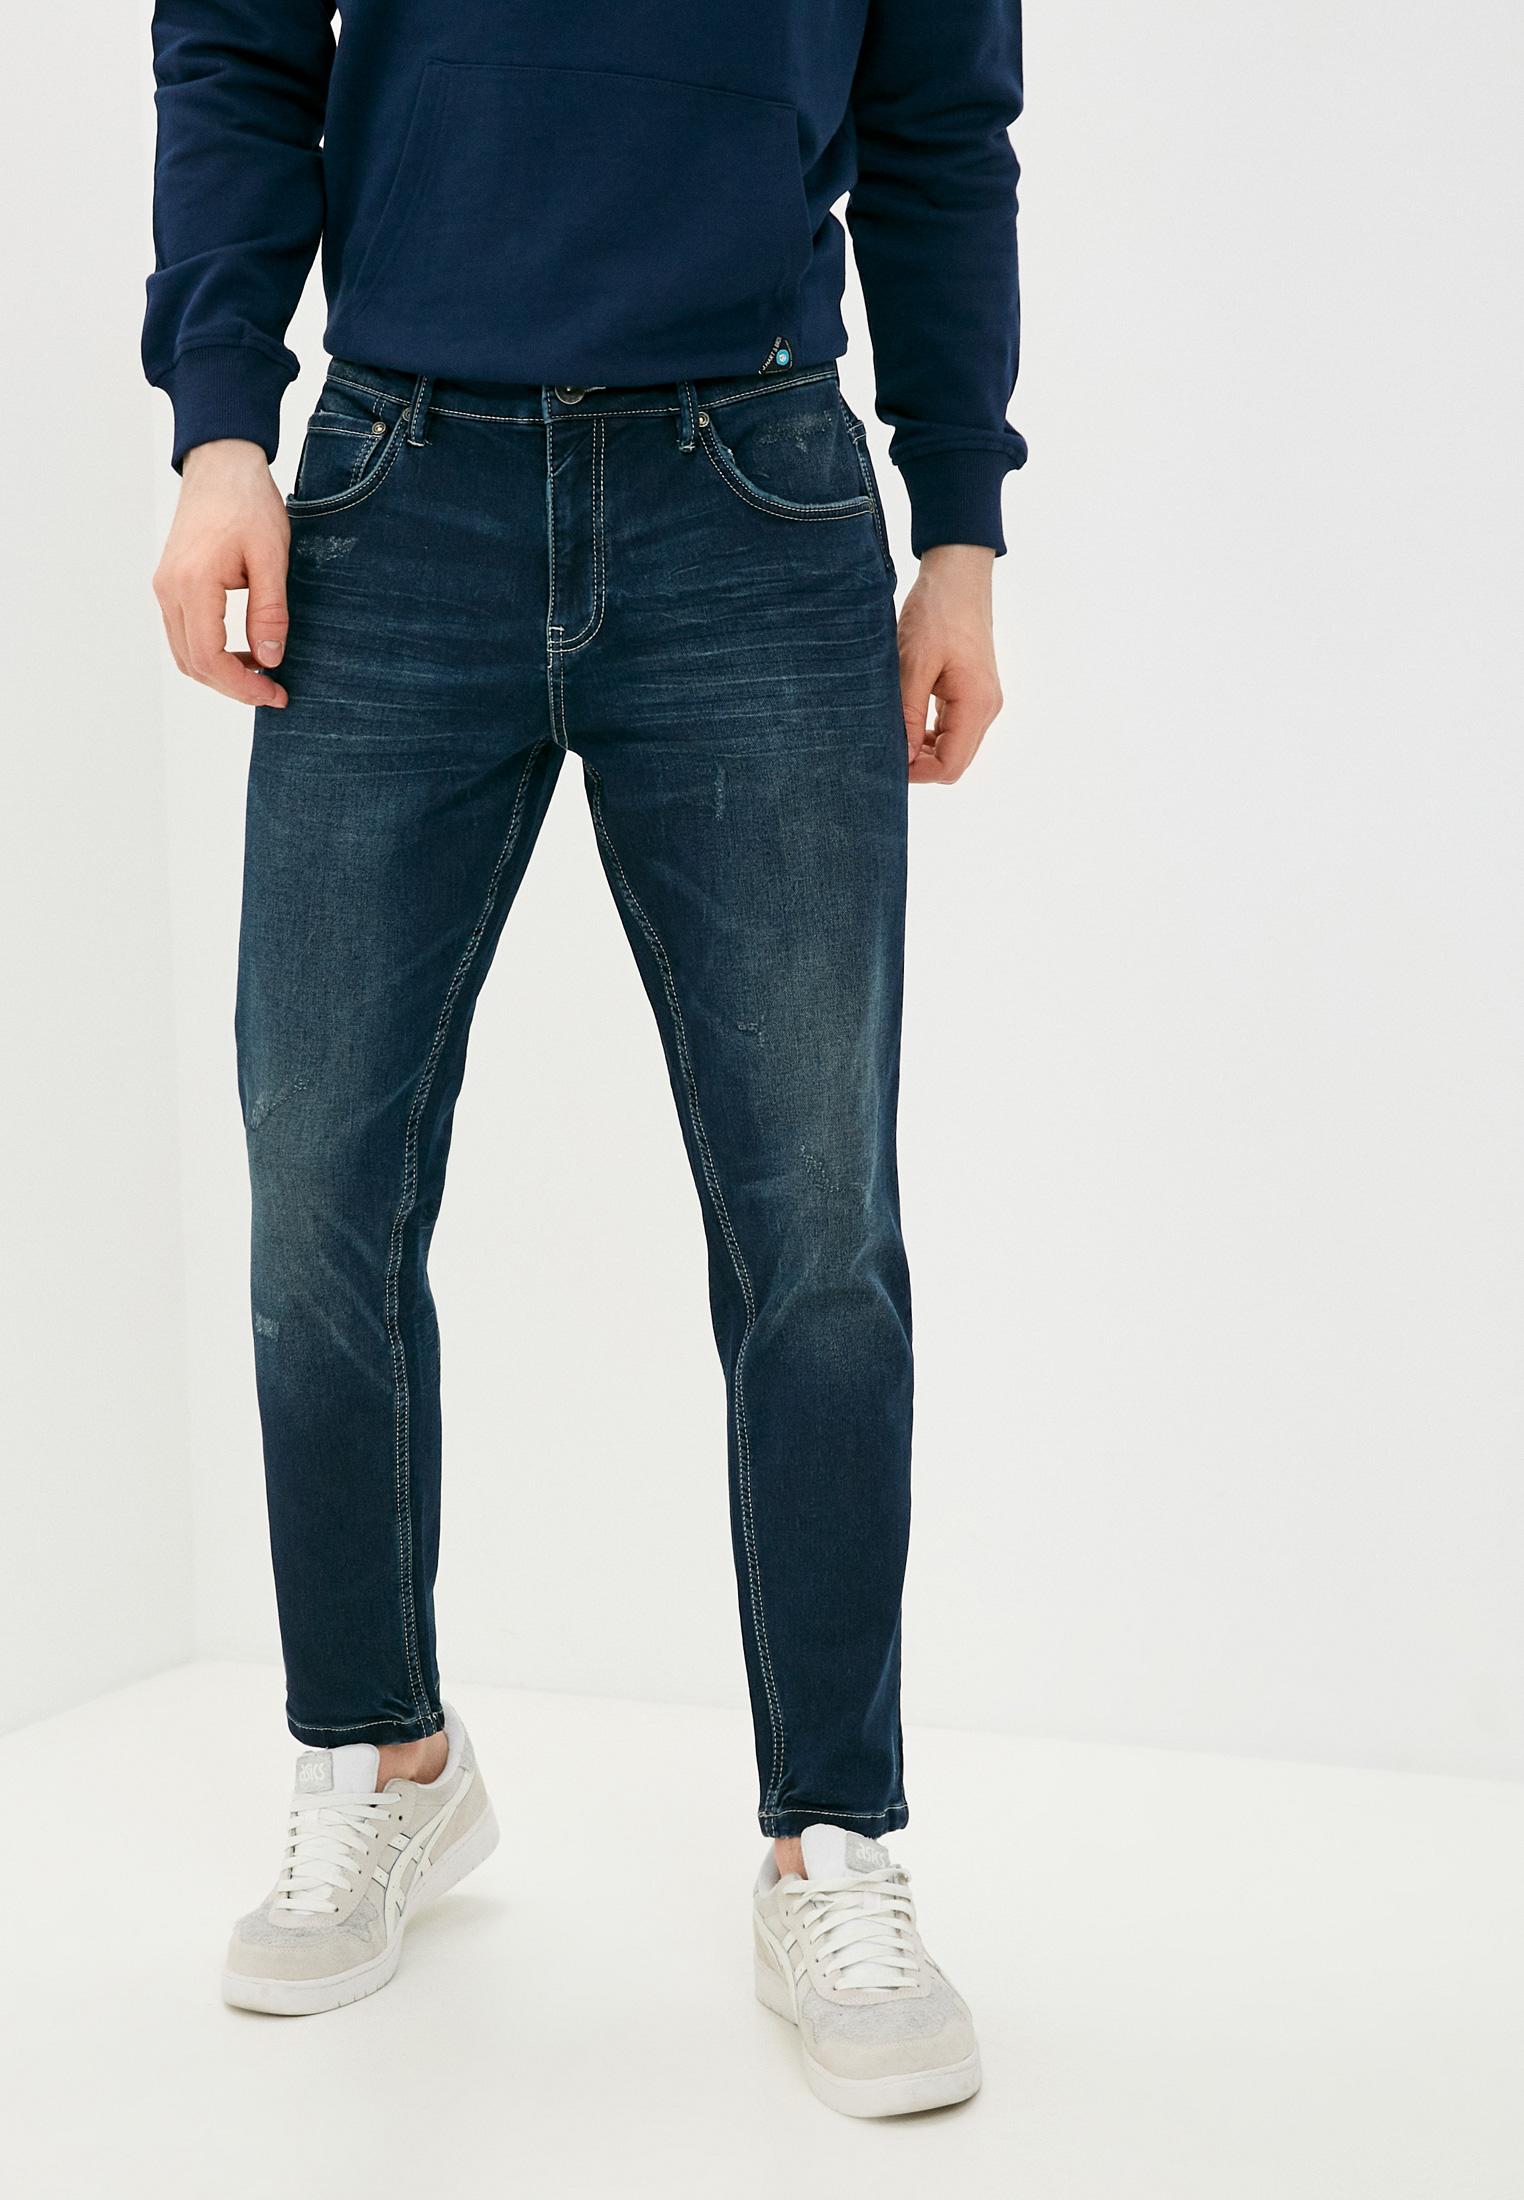 Зауженные джинсы J. Hart & Bros 5656768